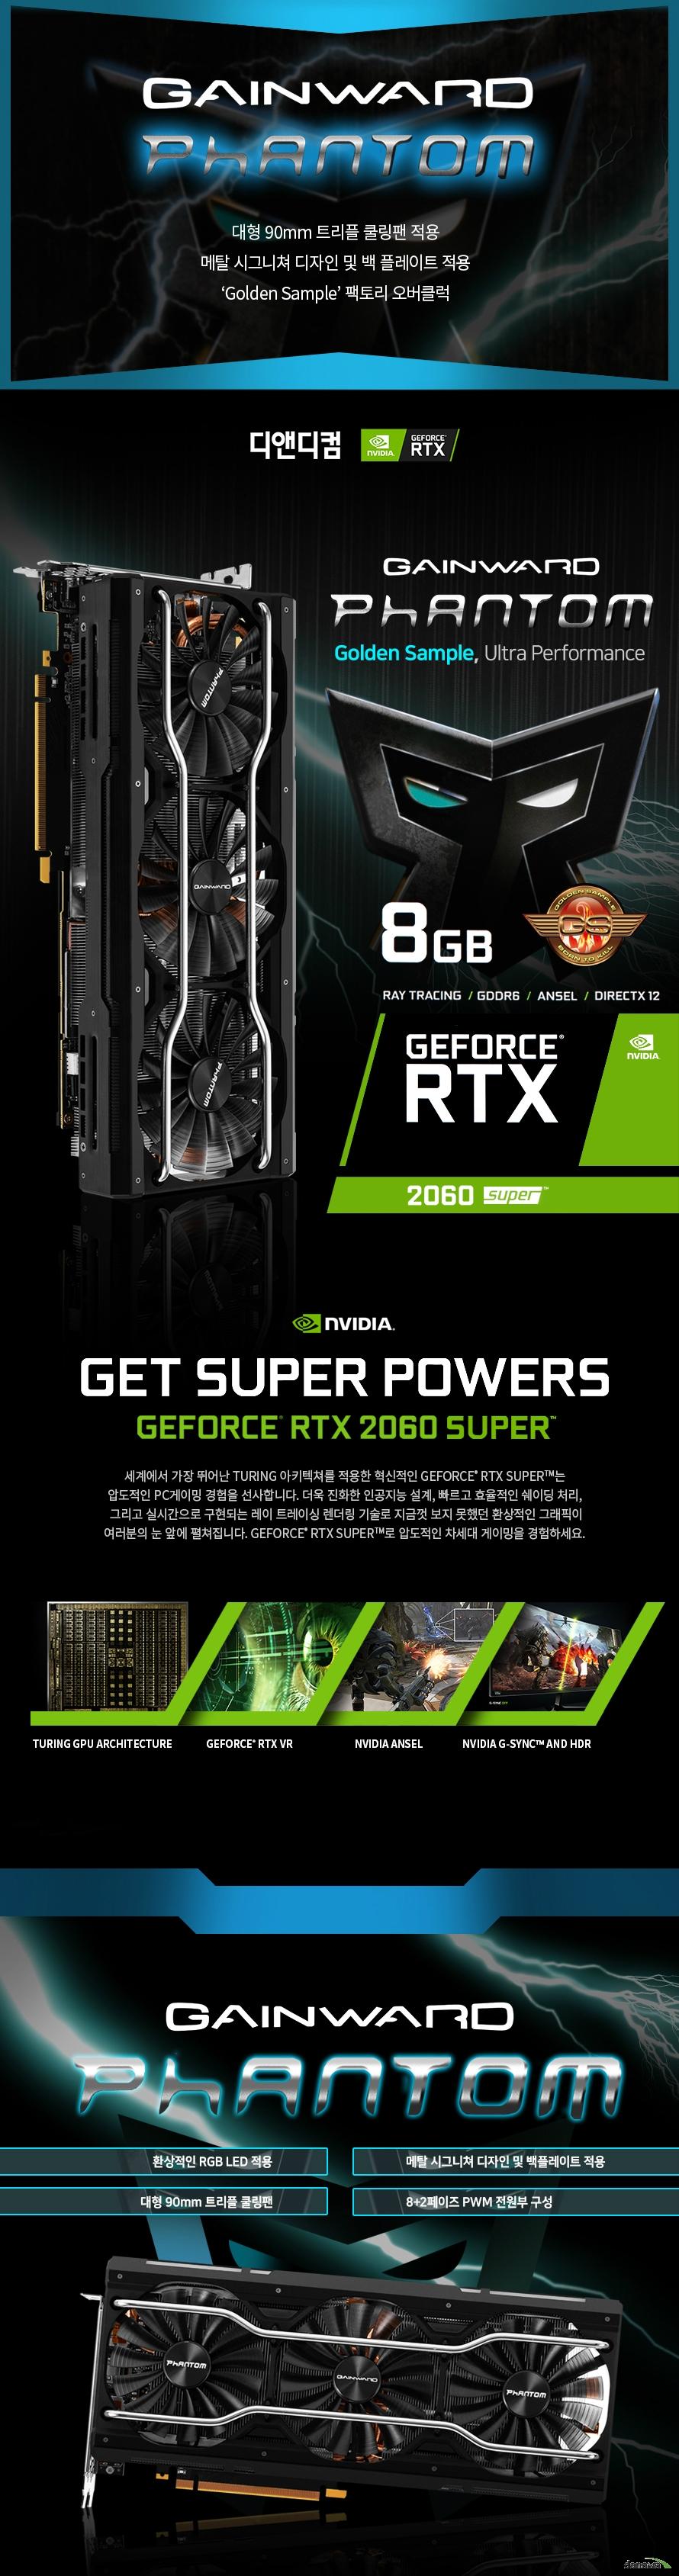 GAINWARD 지포스 RTX 2060 SUPER Phantom GS D6 8GB 디앤디컴  제품 크기      길이 292 밀리미터     높이 130 밀리미터     두께 50 밀리미터          제품 상세정보          GPU 엔진 사양          프로세서 코어 2176개     베이스 클럭 1470메가헤르츠     부스트 클럭 1830메가헤르츠          메모리 사양          메모리 속도 14000메가헤르츠     메모리 용량 8기가바이트     메모리 인터페이스 GDDR6 256비트          디스플레이 출력 정보          모니터 동시 지원 최대 4대     최대 해상도 7680 4320     출력 포트 DP1.4 포트 3개 HDMI 2.0포트 1개         제품 전력 사양          그래픽카드 소모 전력 215와트     최소 시스템 요구 전력 550와트     전원 커넥터 8+6핀           제품 추가 사양          제품 인증번호 R R DND GW R2060 PT     품질 보증기간 3년 무상 보증       디앤디컴 3년무상 서비스          디앤디컴에서 유통하는 게인워드 지포스 gtx 제품은 3년 무상 품질 보증 서비스를 제공합니다.     디앤디컴 서비스 센터 02 702 1358